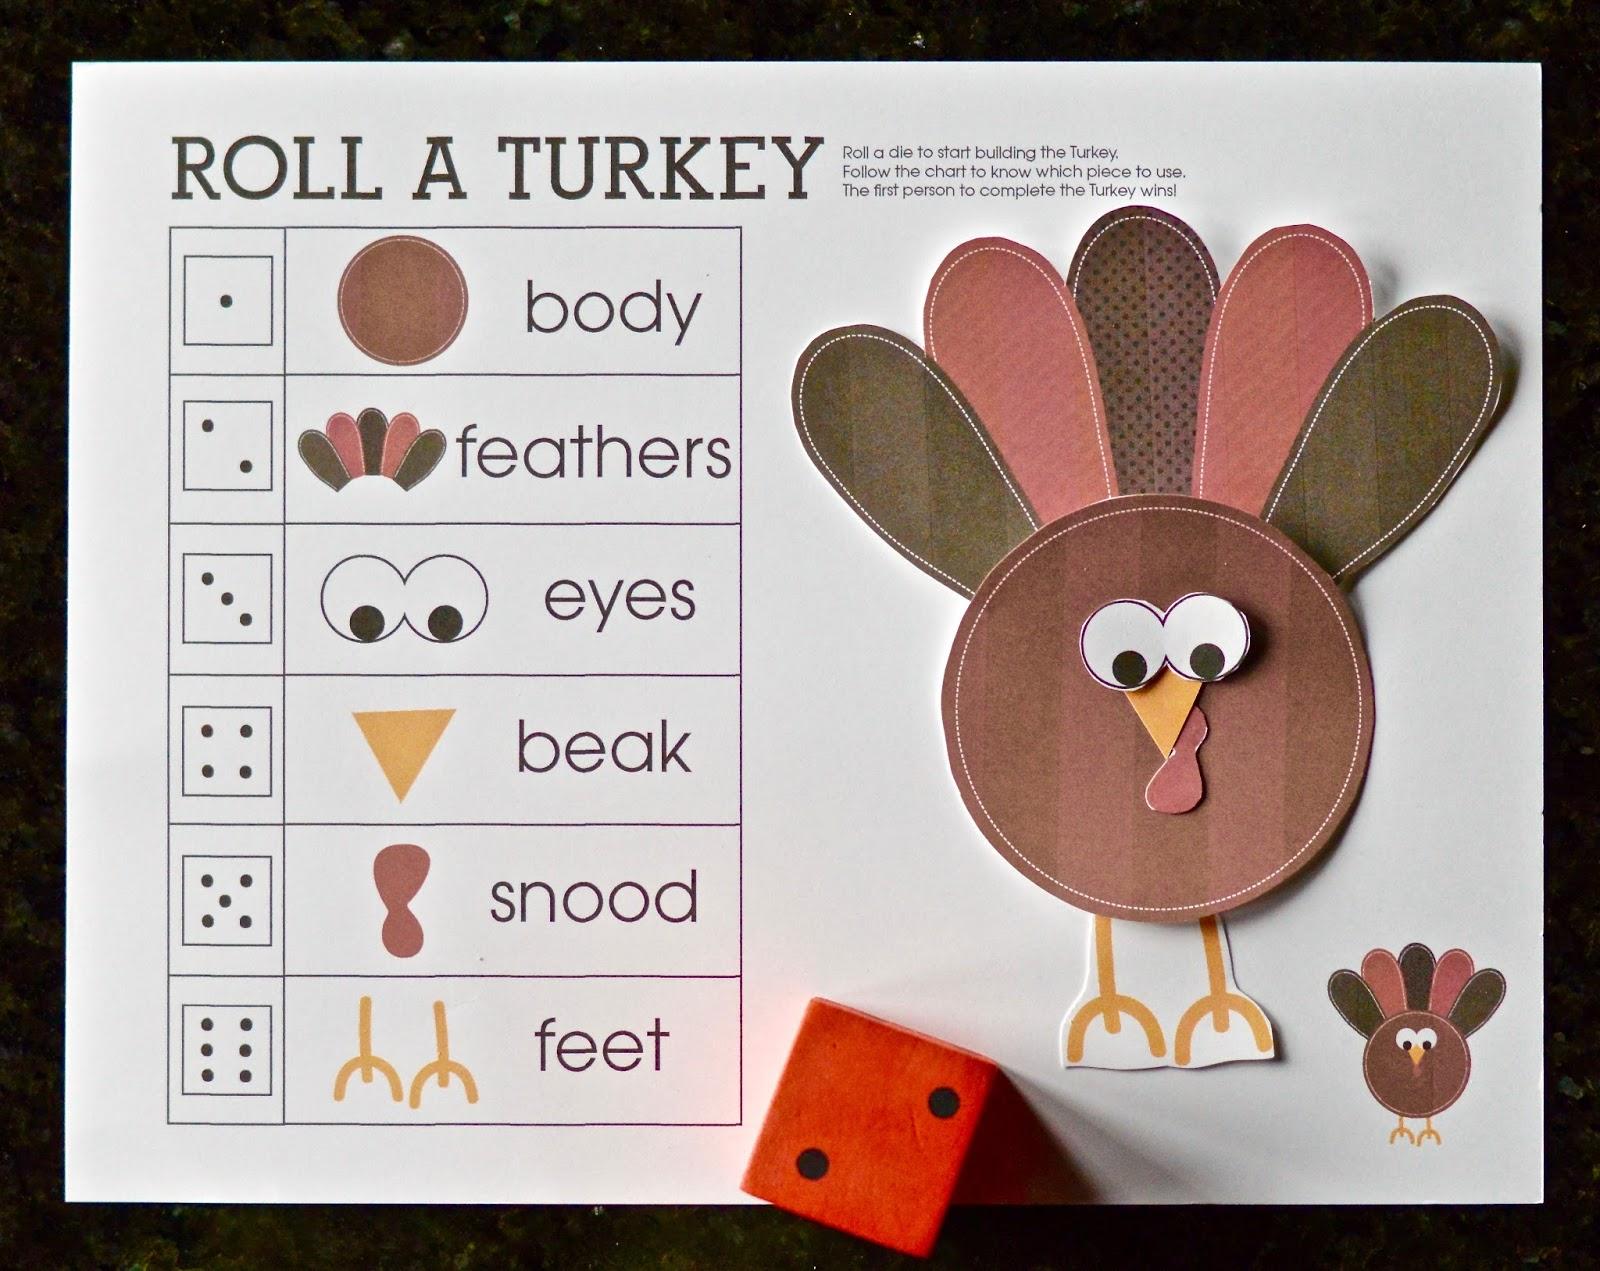 Roll A Turkey Dice Game